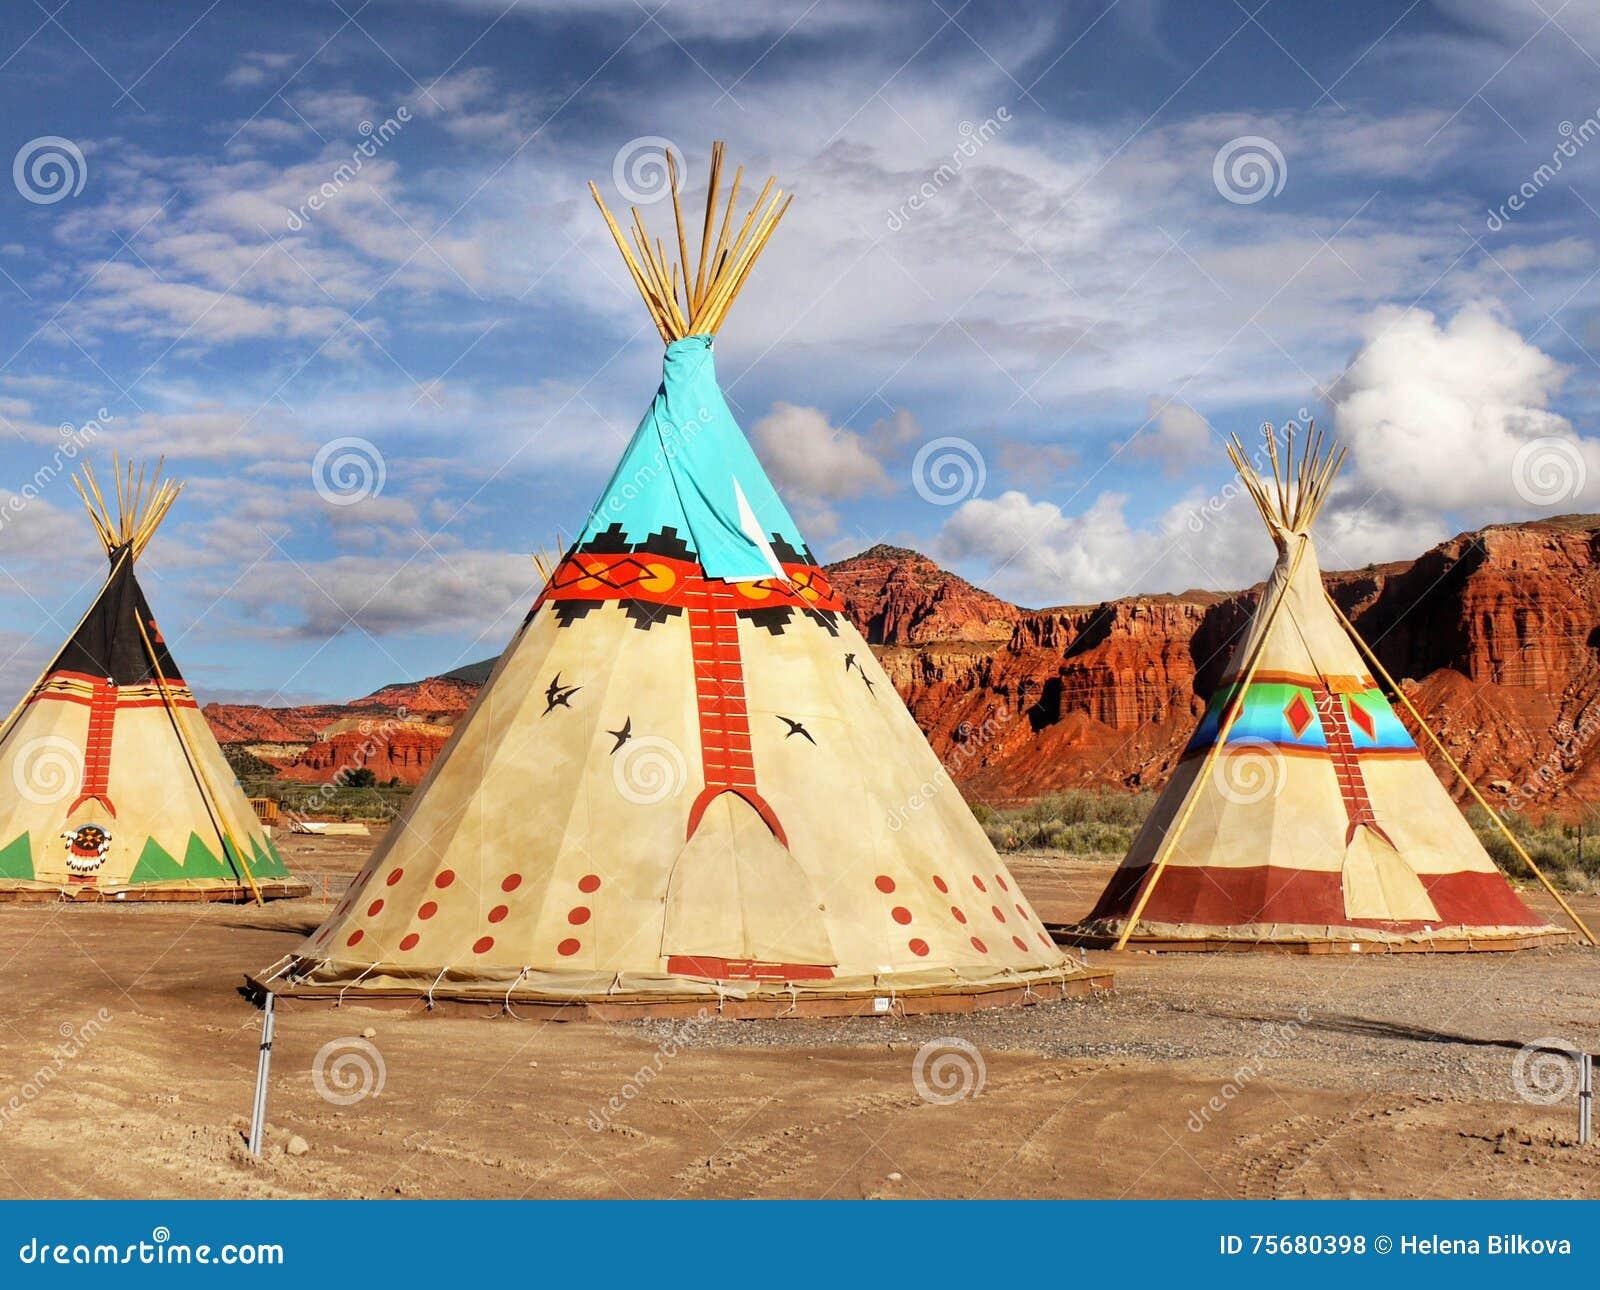 teepee wigwam indian tents editorial stock photo image